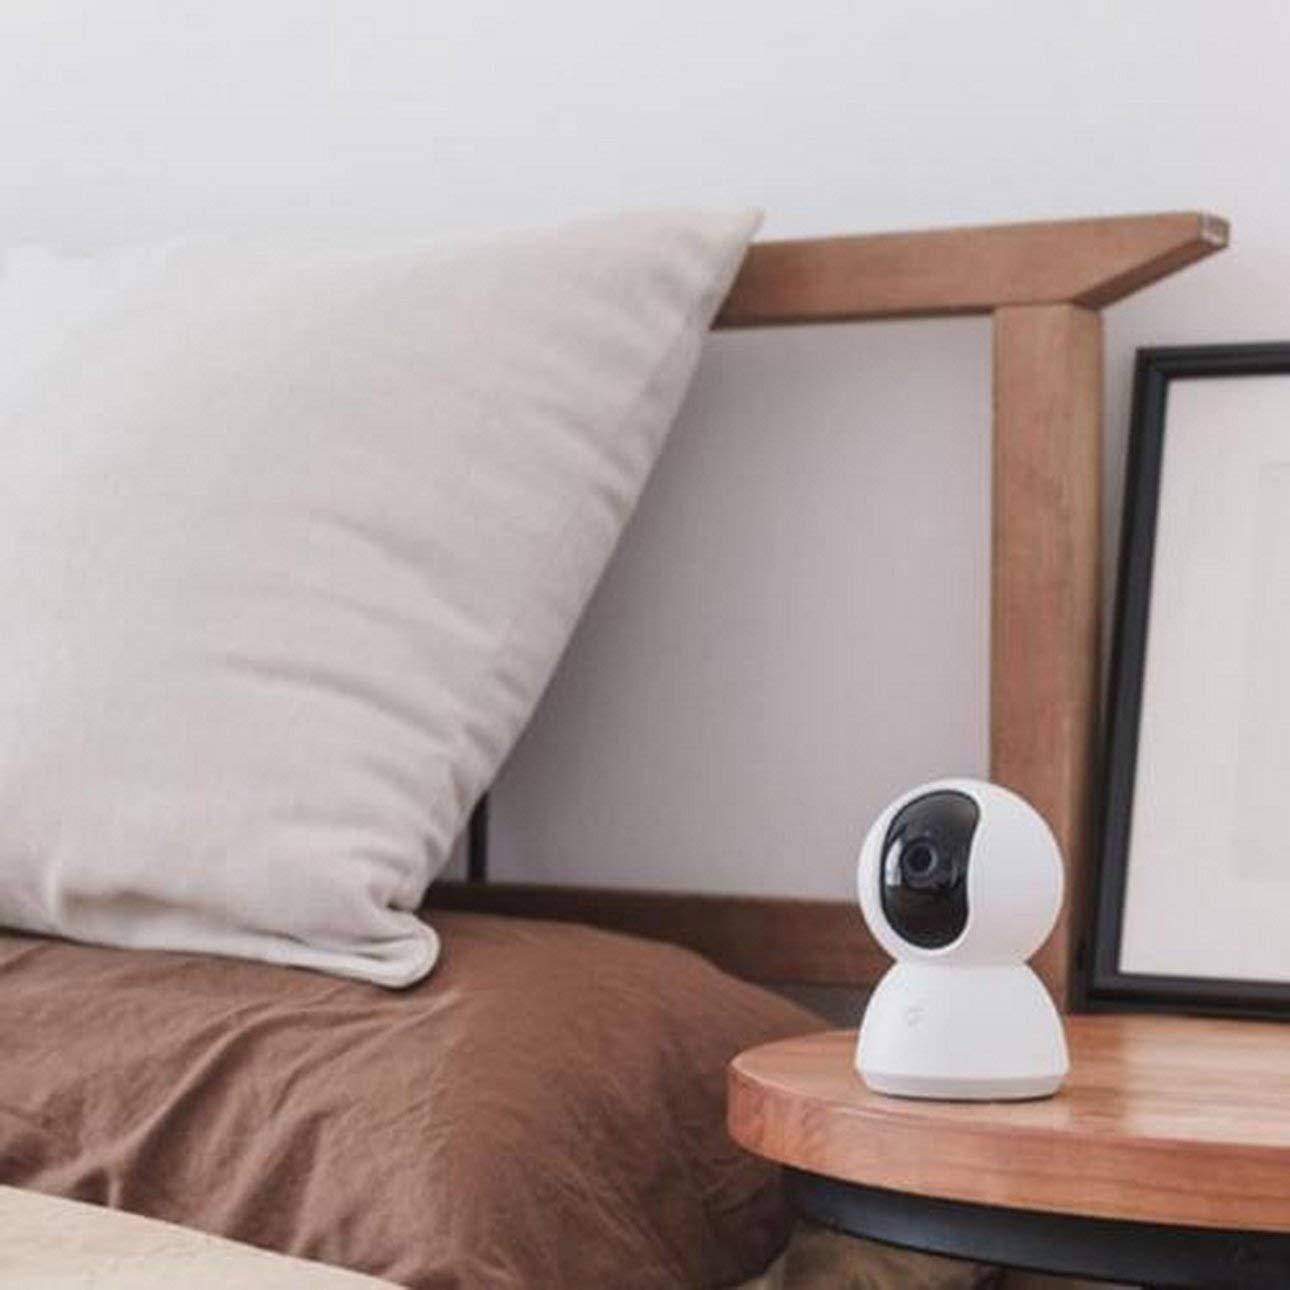 Amazon.com : Liobaba Wireless WiFi 1080P Pan Tilt Baby Security IP Camera IR Night CCTV Home Webcam for Home Security : Garden & Outdoor